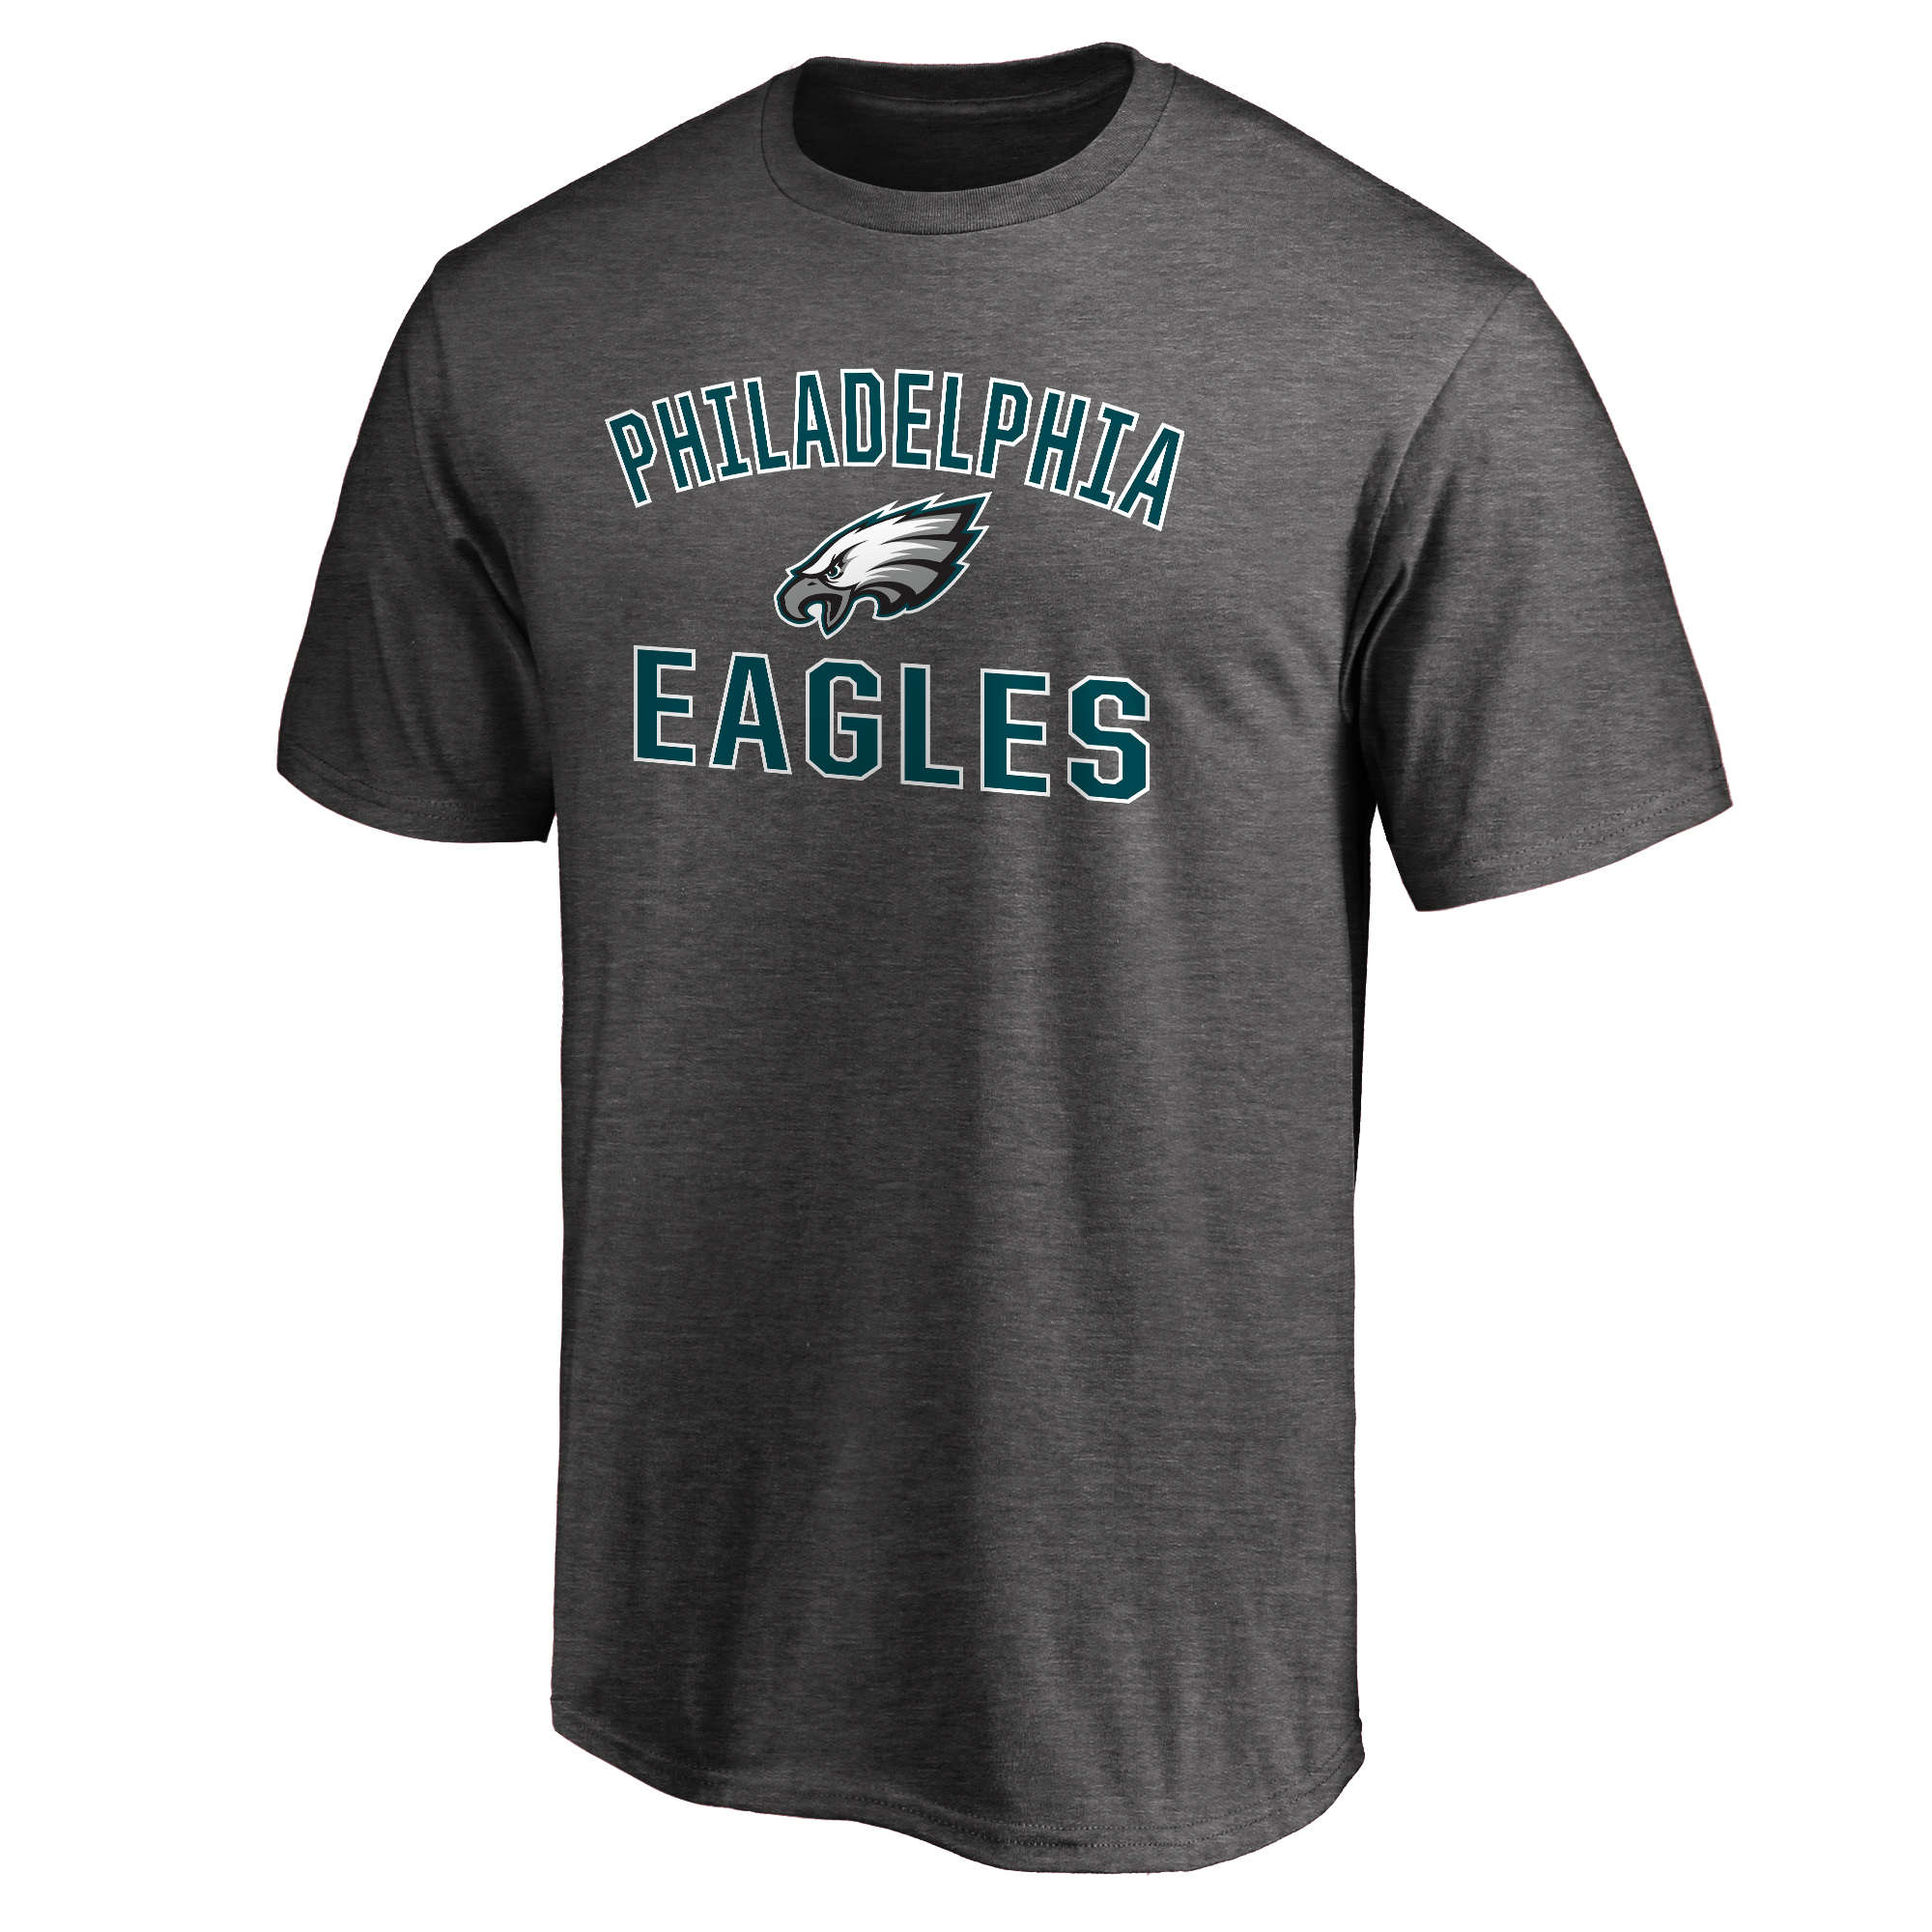 Philadelphia Eagles NFL Pro Line Victory Arch T-Shirt - Gray